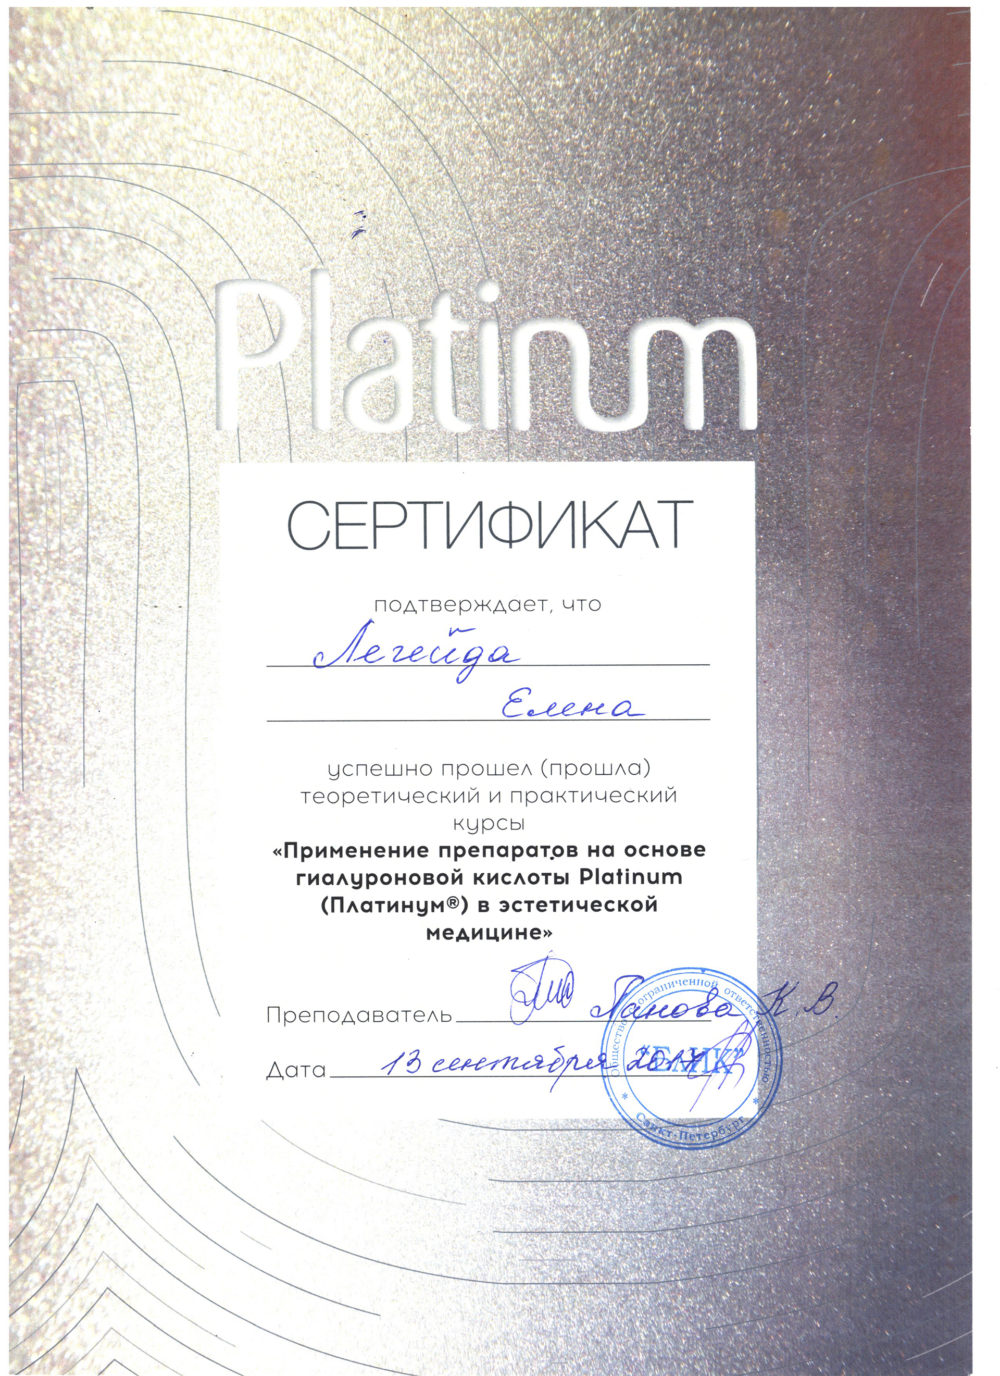 Сертификат - Применение препарата Platinum. Легейда Елена Валерьевна